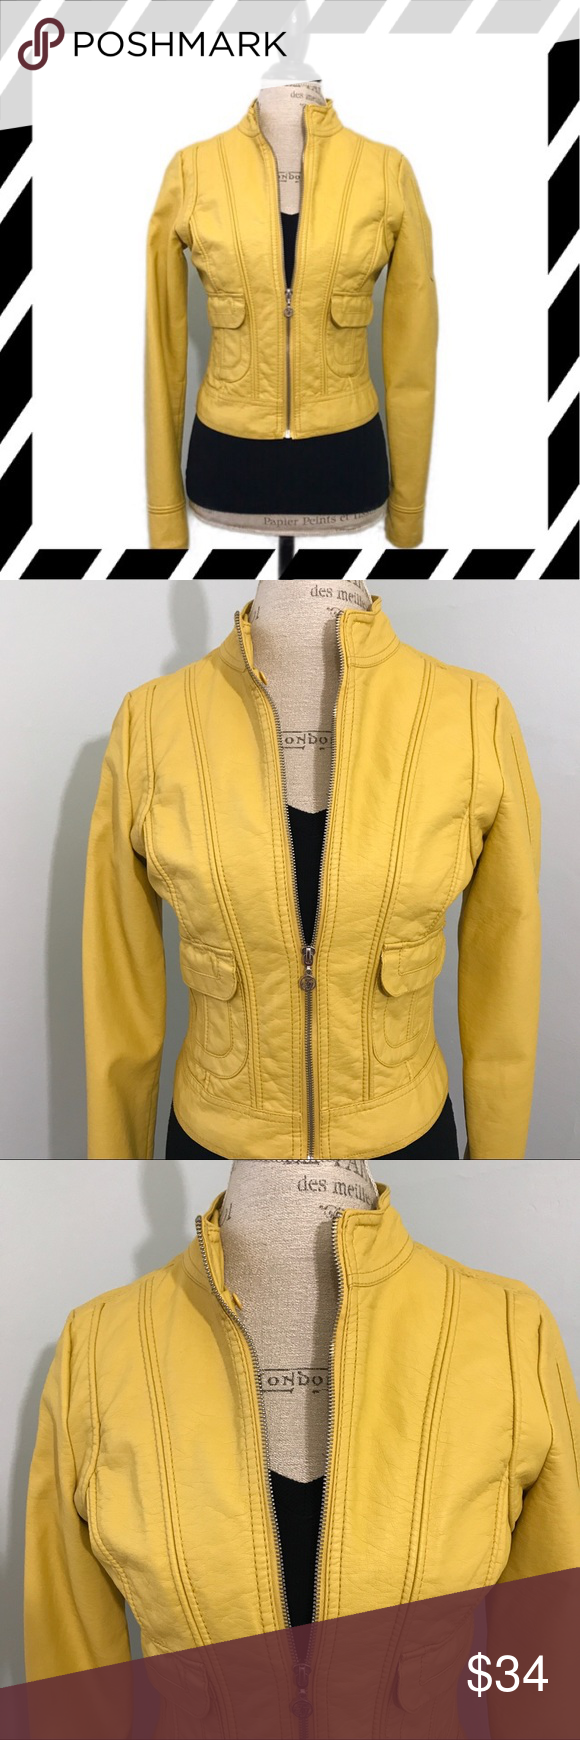 Jou Jou • Moto Jacket Fashion, Clothes design, Fashion